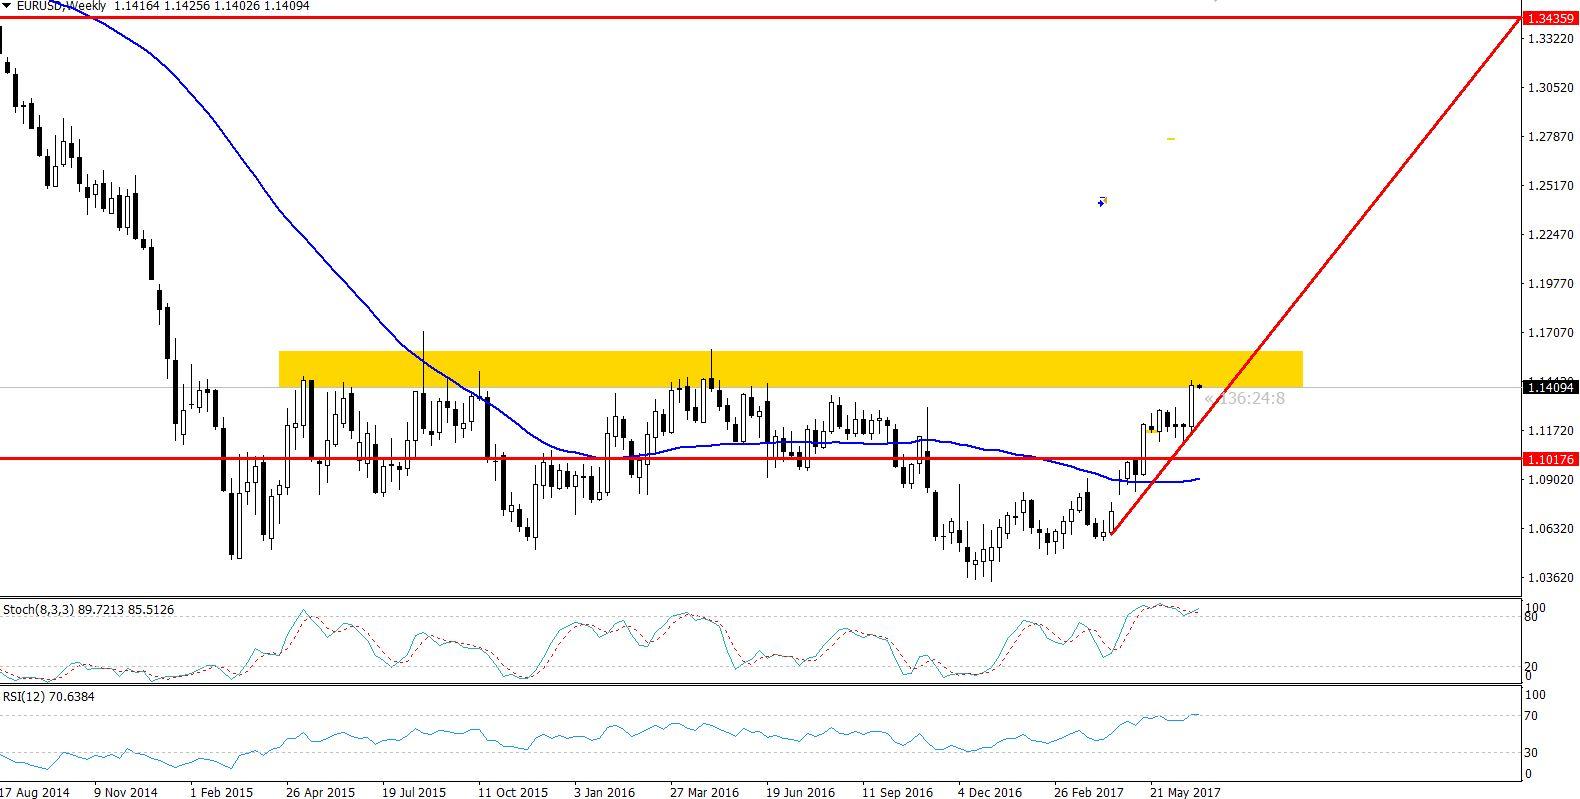 EURUSD - Triple Top Pattern - Weekly Chart